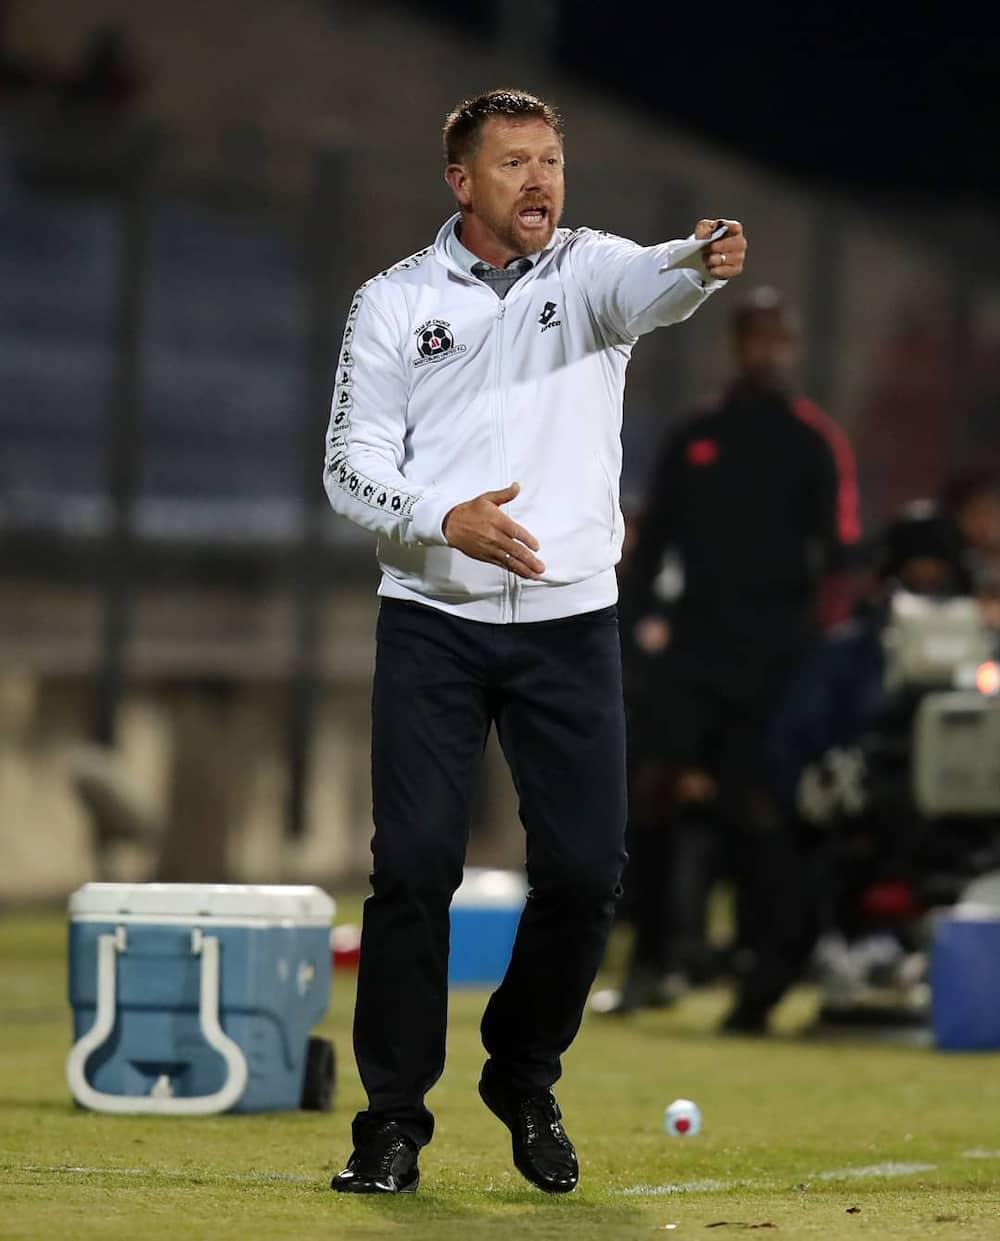 Highest earning PSL coach